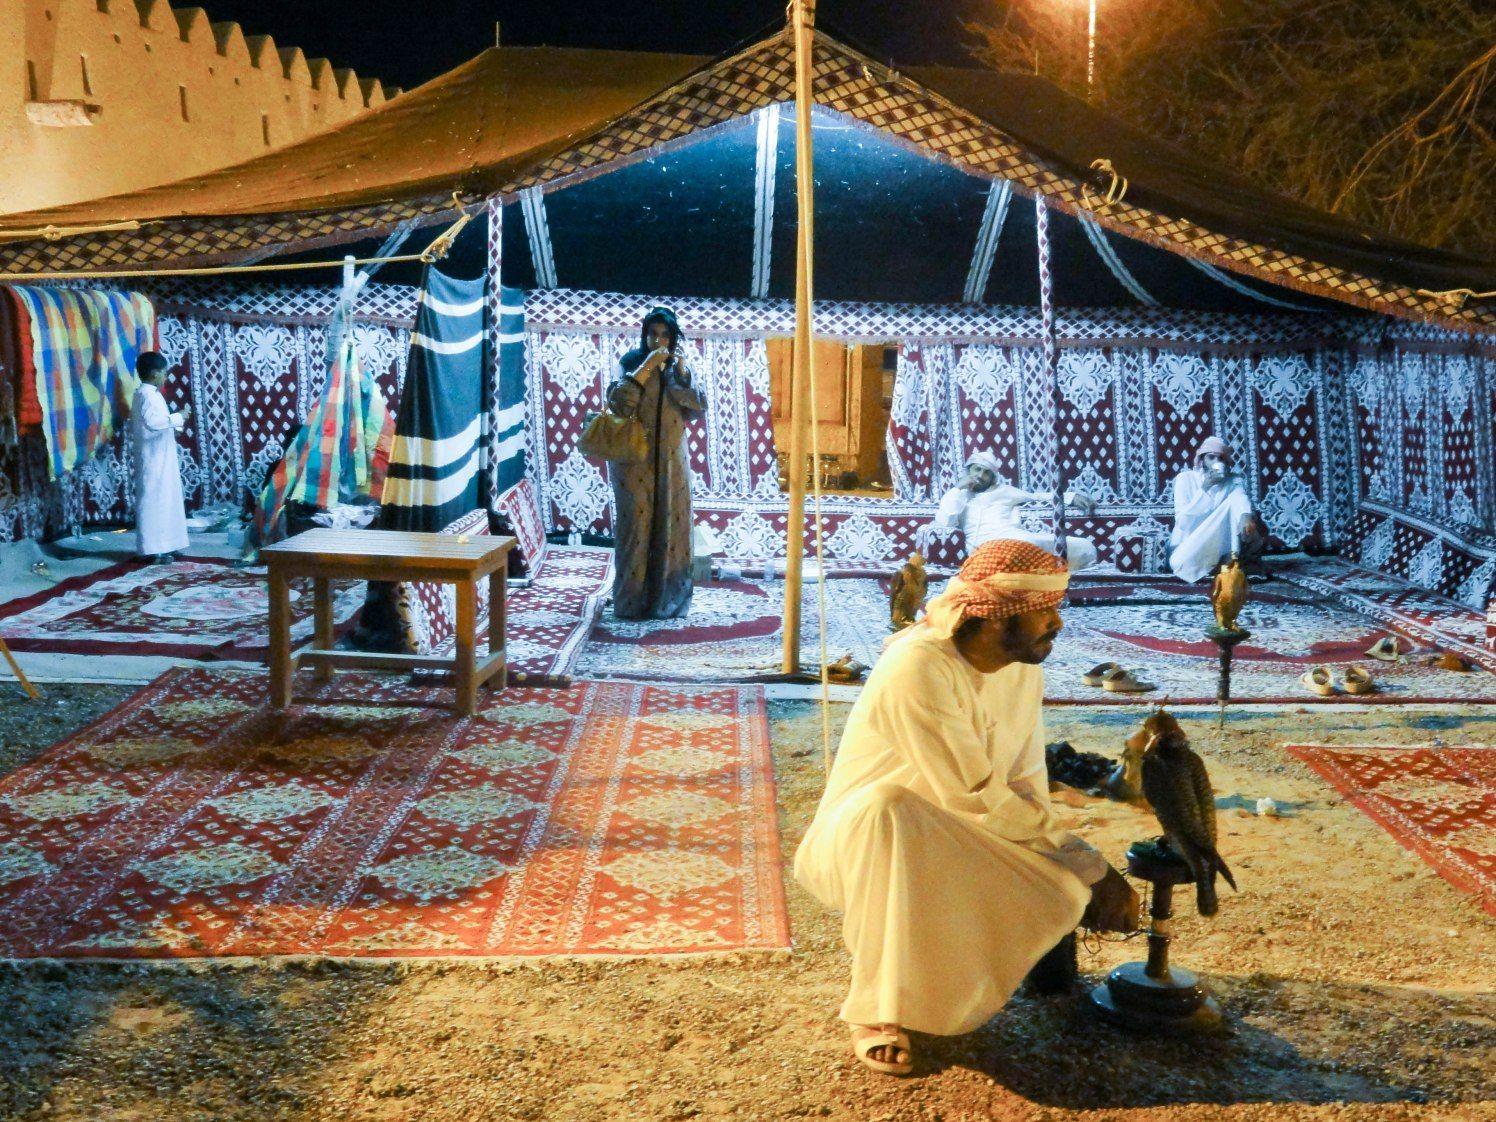 Al Ain Uae Handicrafts Festival At The Al Qattara Arts Centre